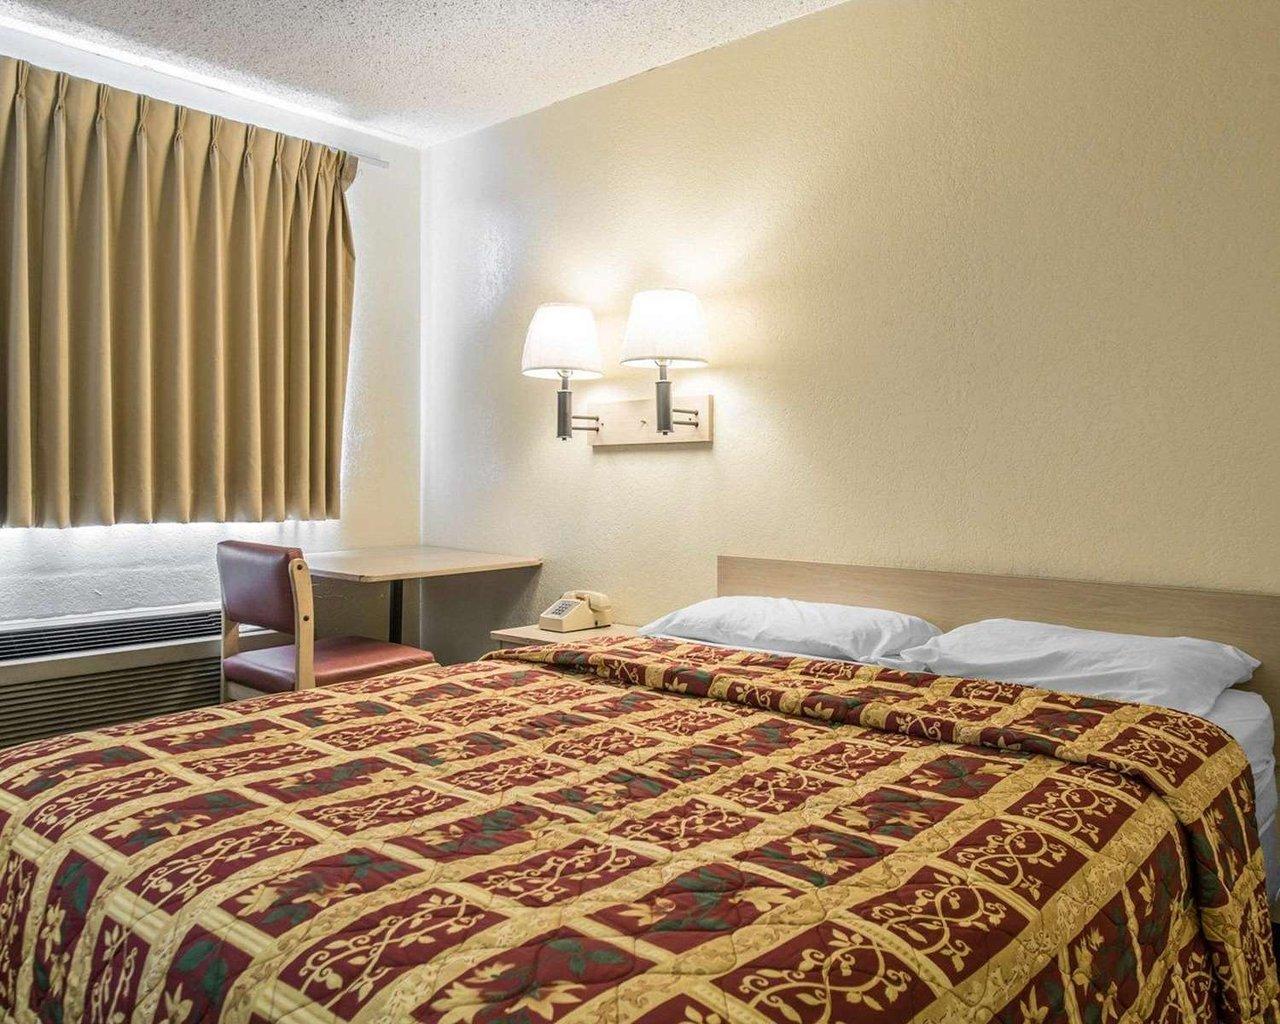 rodeway inn 54 7 4 updated 2019 prices hotel reviews rh tripadvisor com